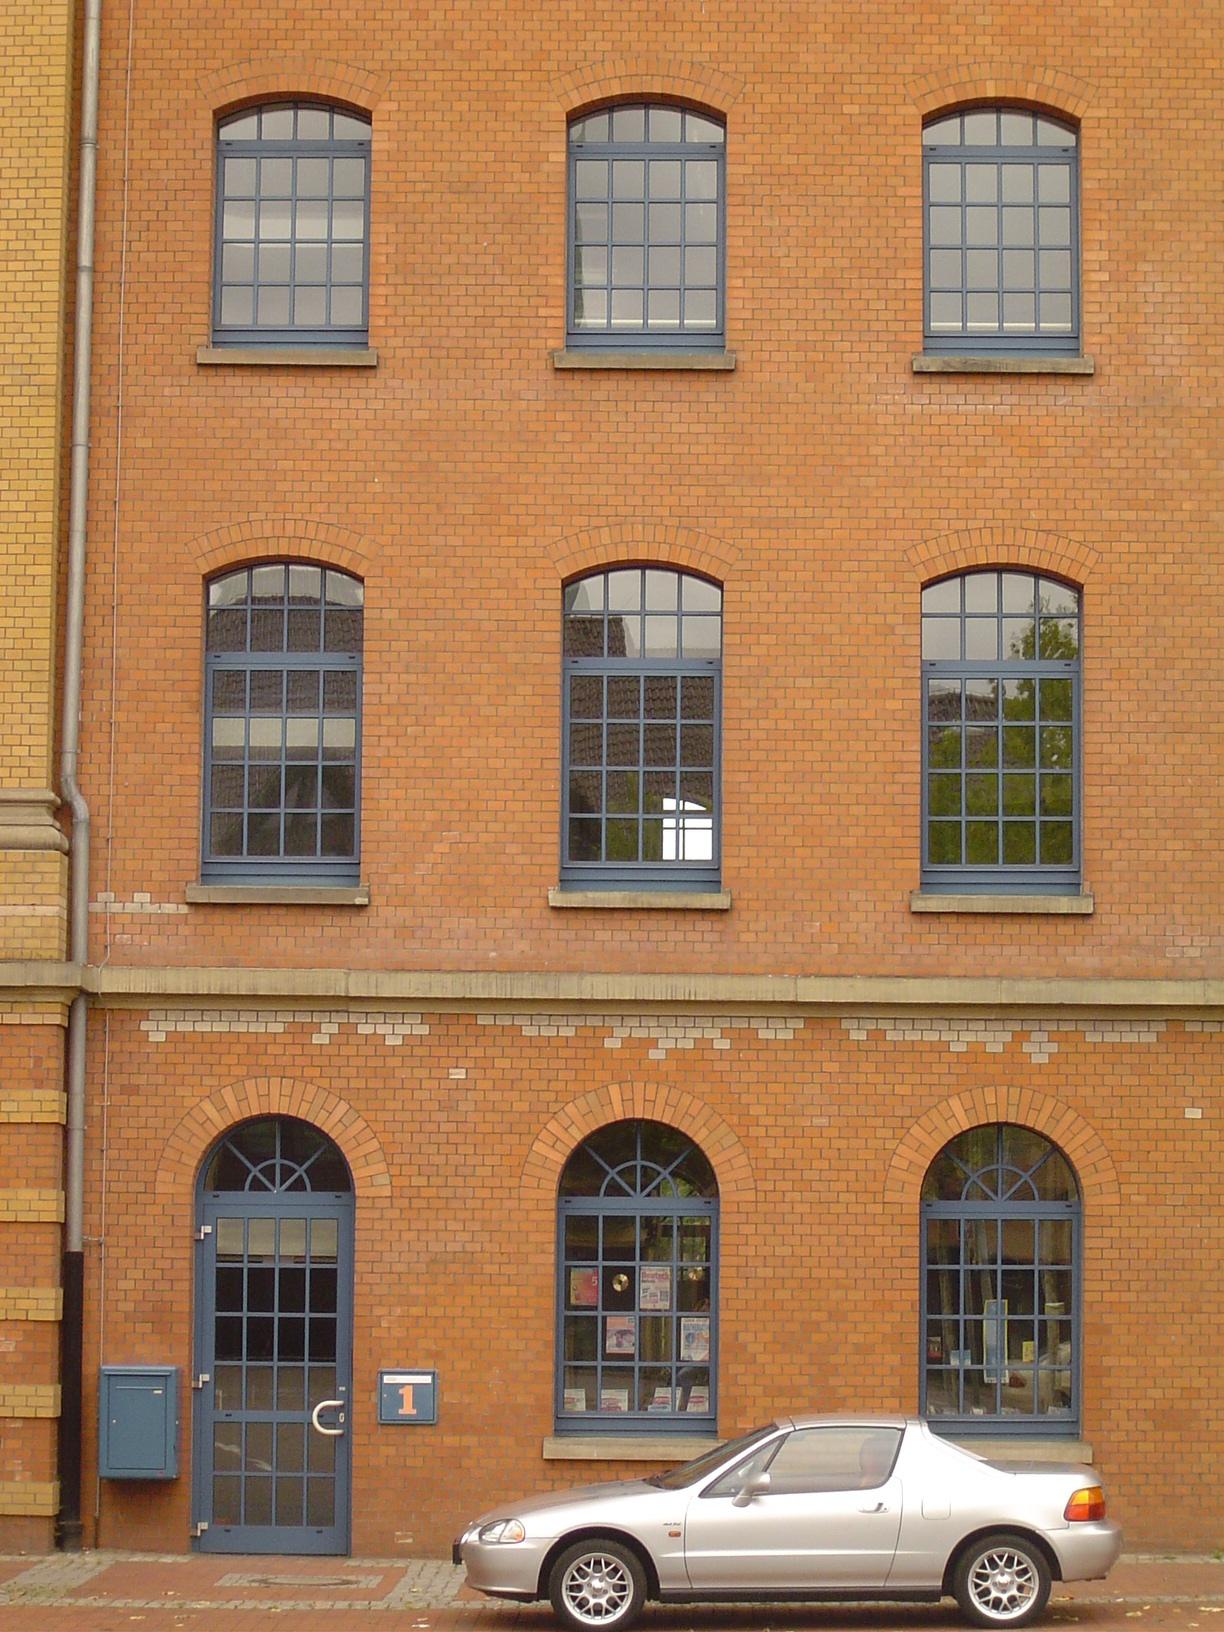 rigoletto facade architecture building windows car side wall